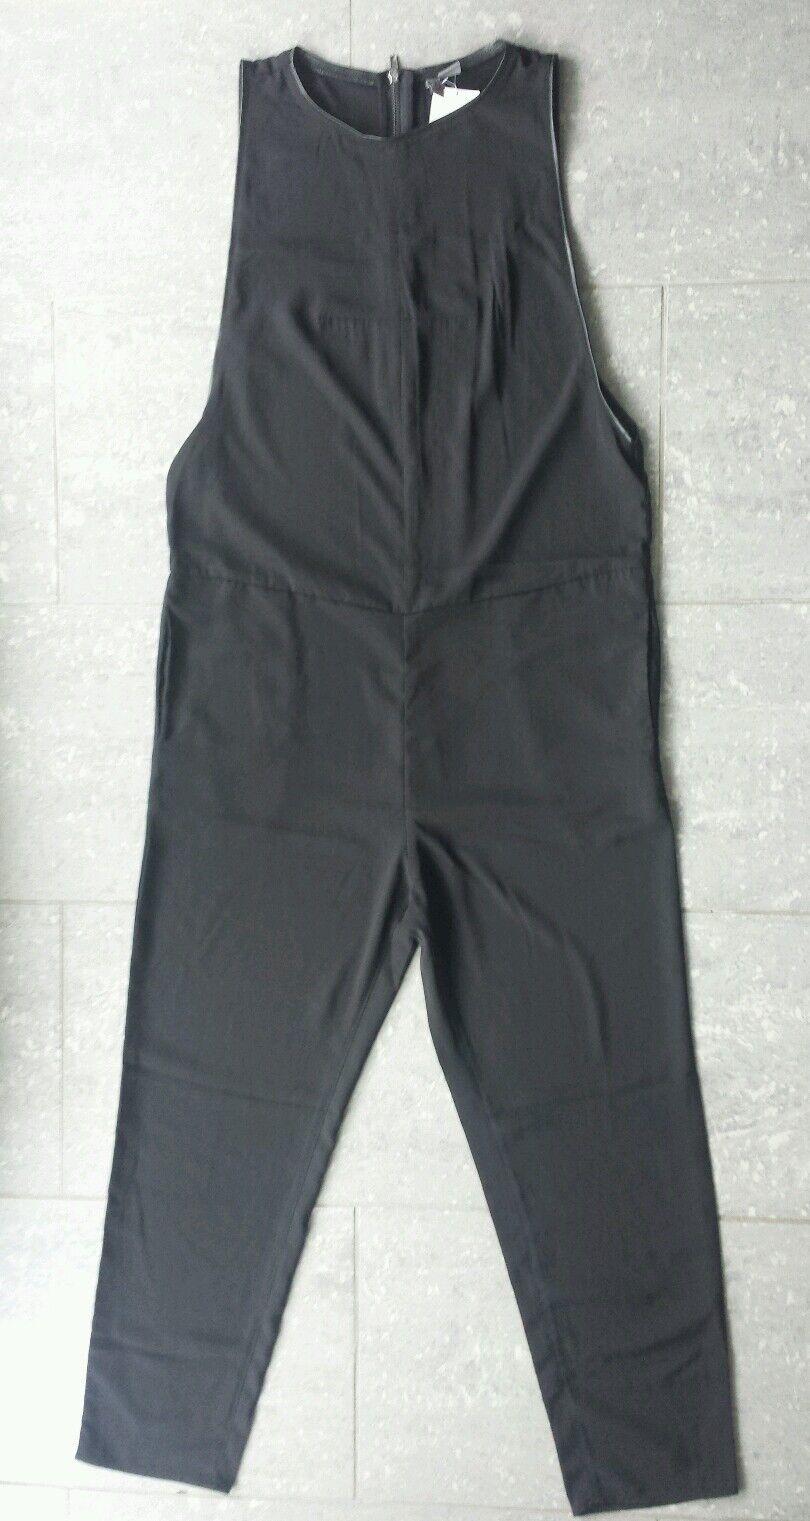 Neu! Damen Jumpsuit gr.40 schwarz